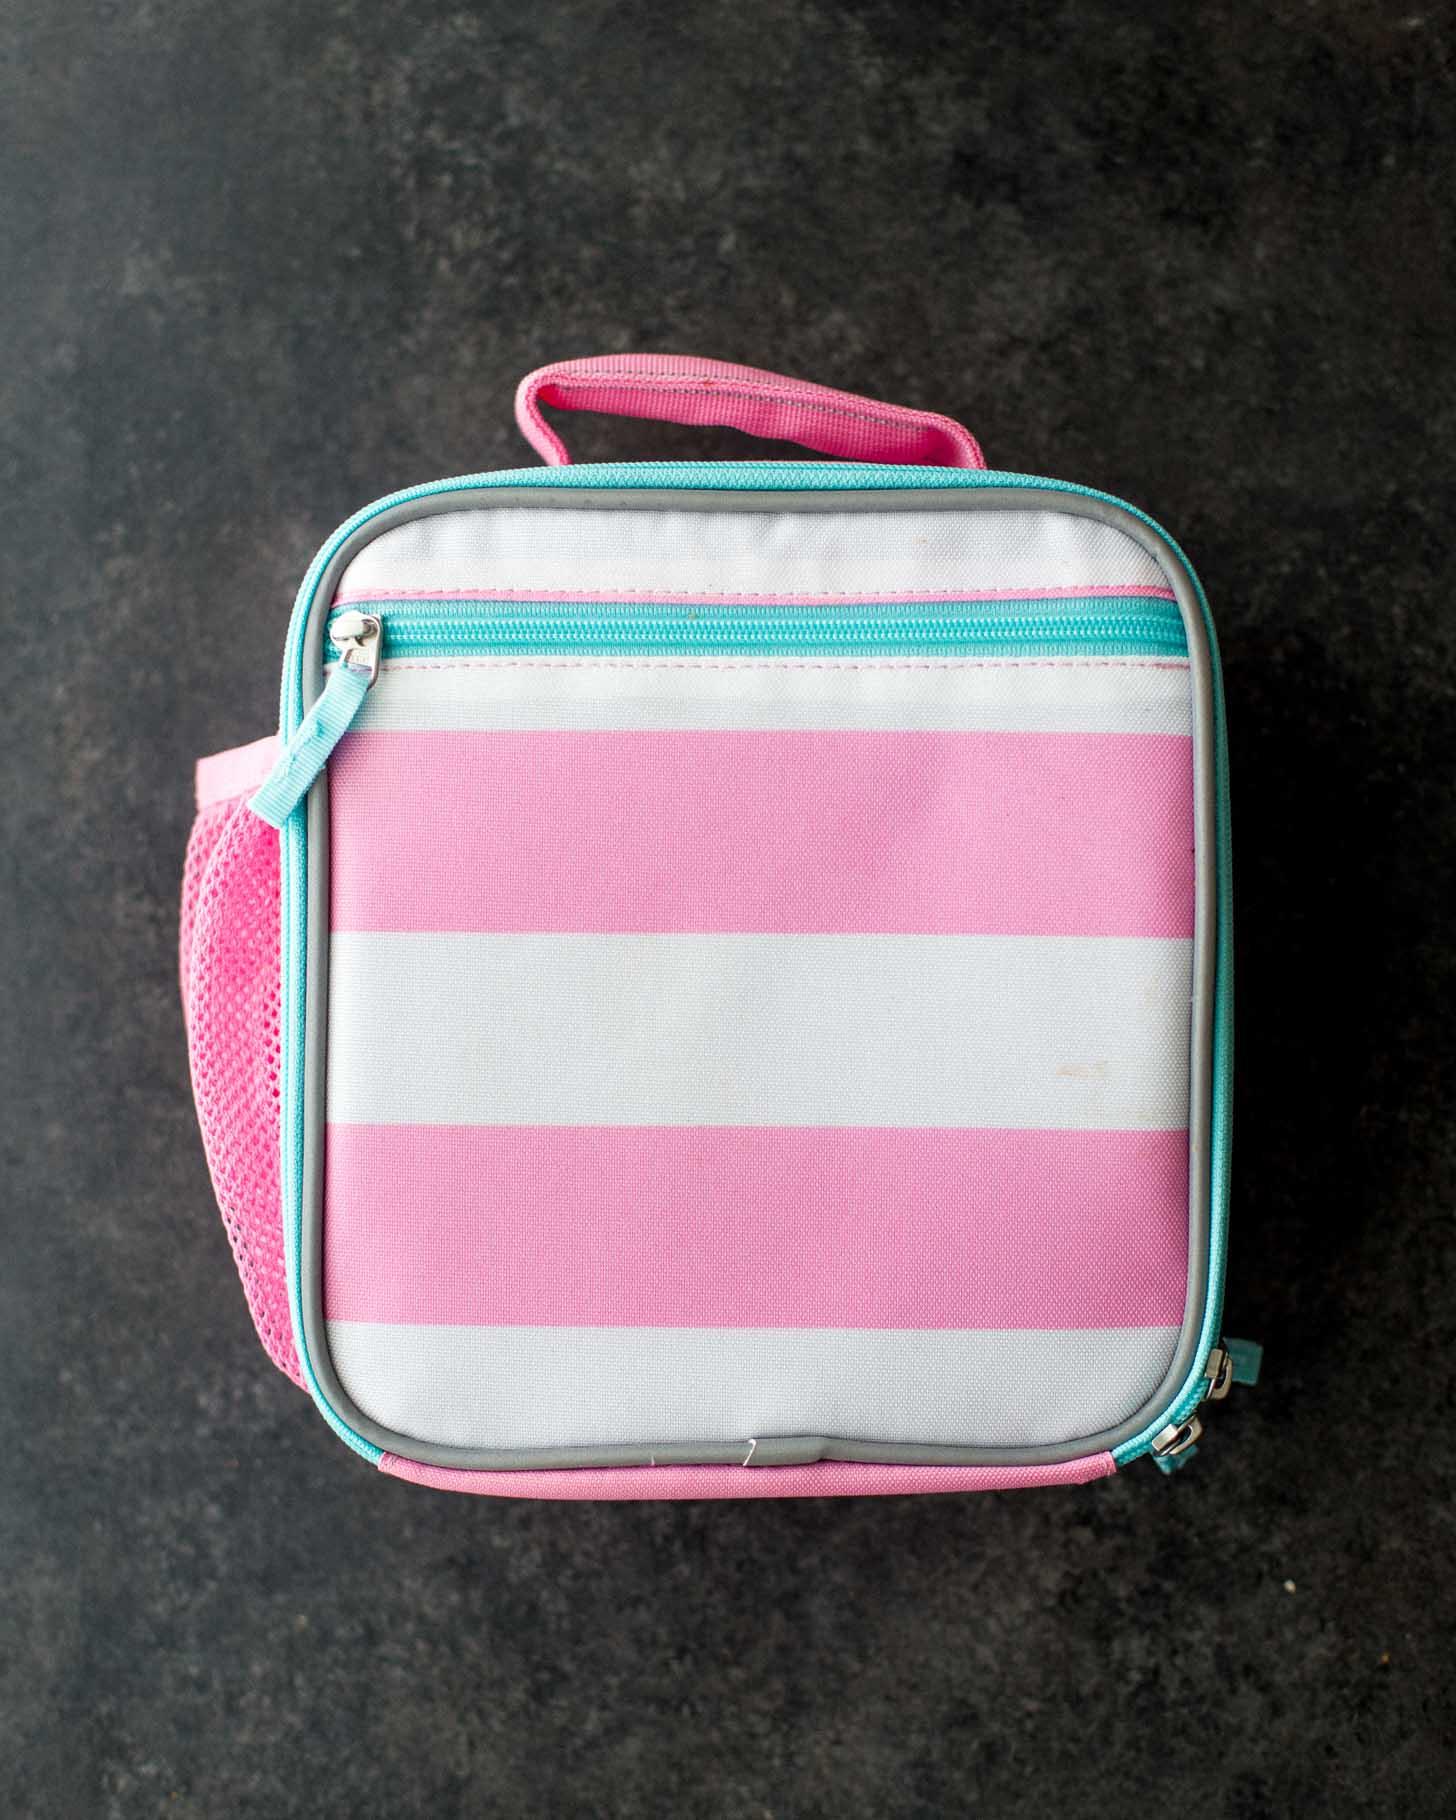 Pottery Barn Fairfax Classic Lunch Box / Bag